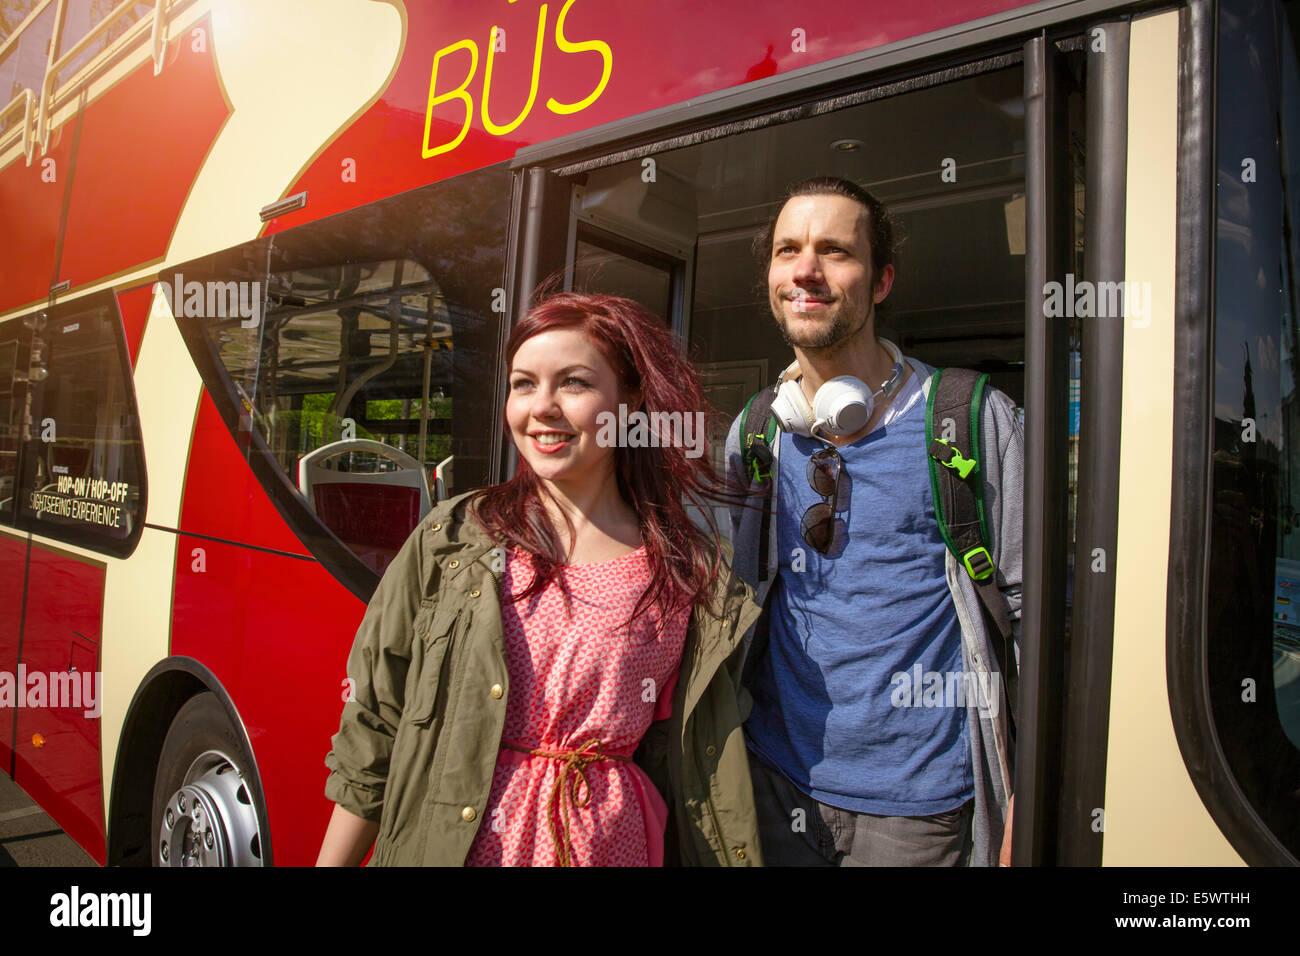 Junge Erwachsene paar Bus aussteigen Stockbild